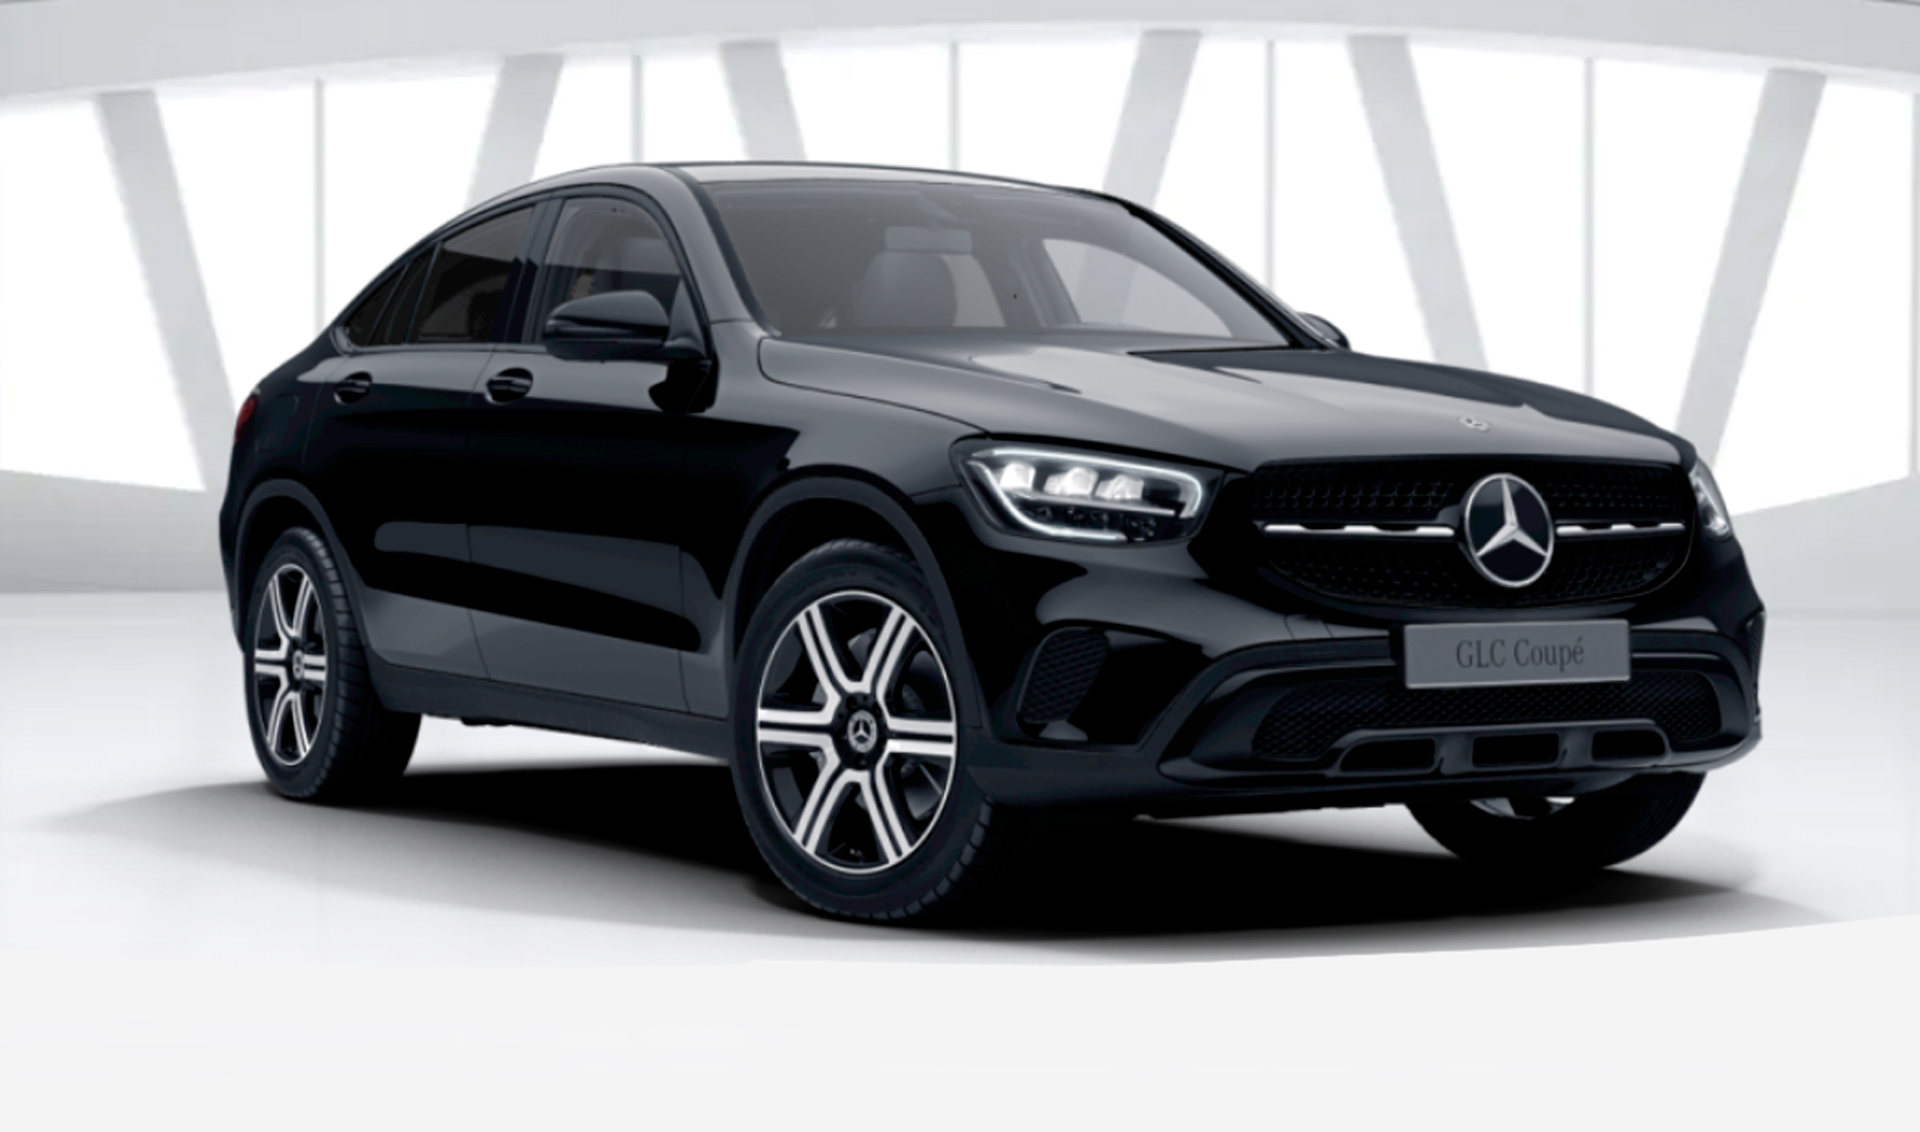 Mercedes-Benz GLC Coupe  0152632095